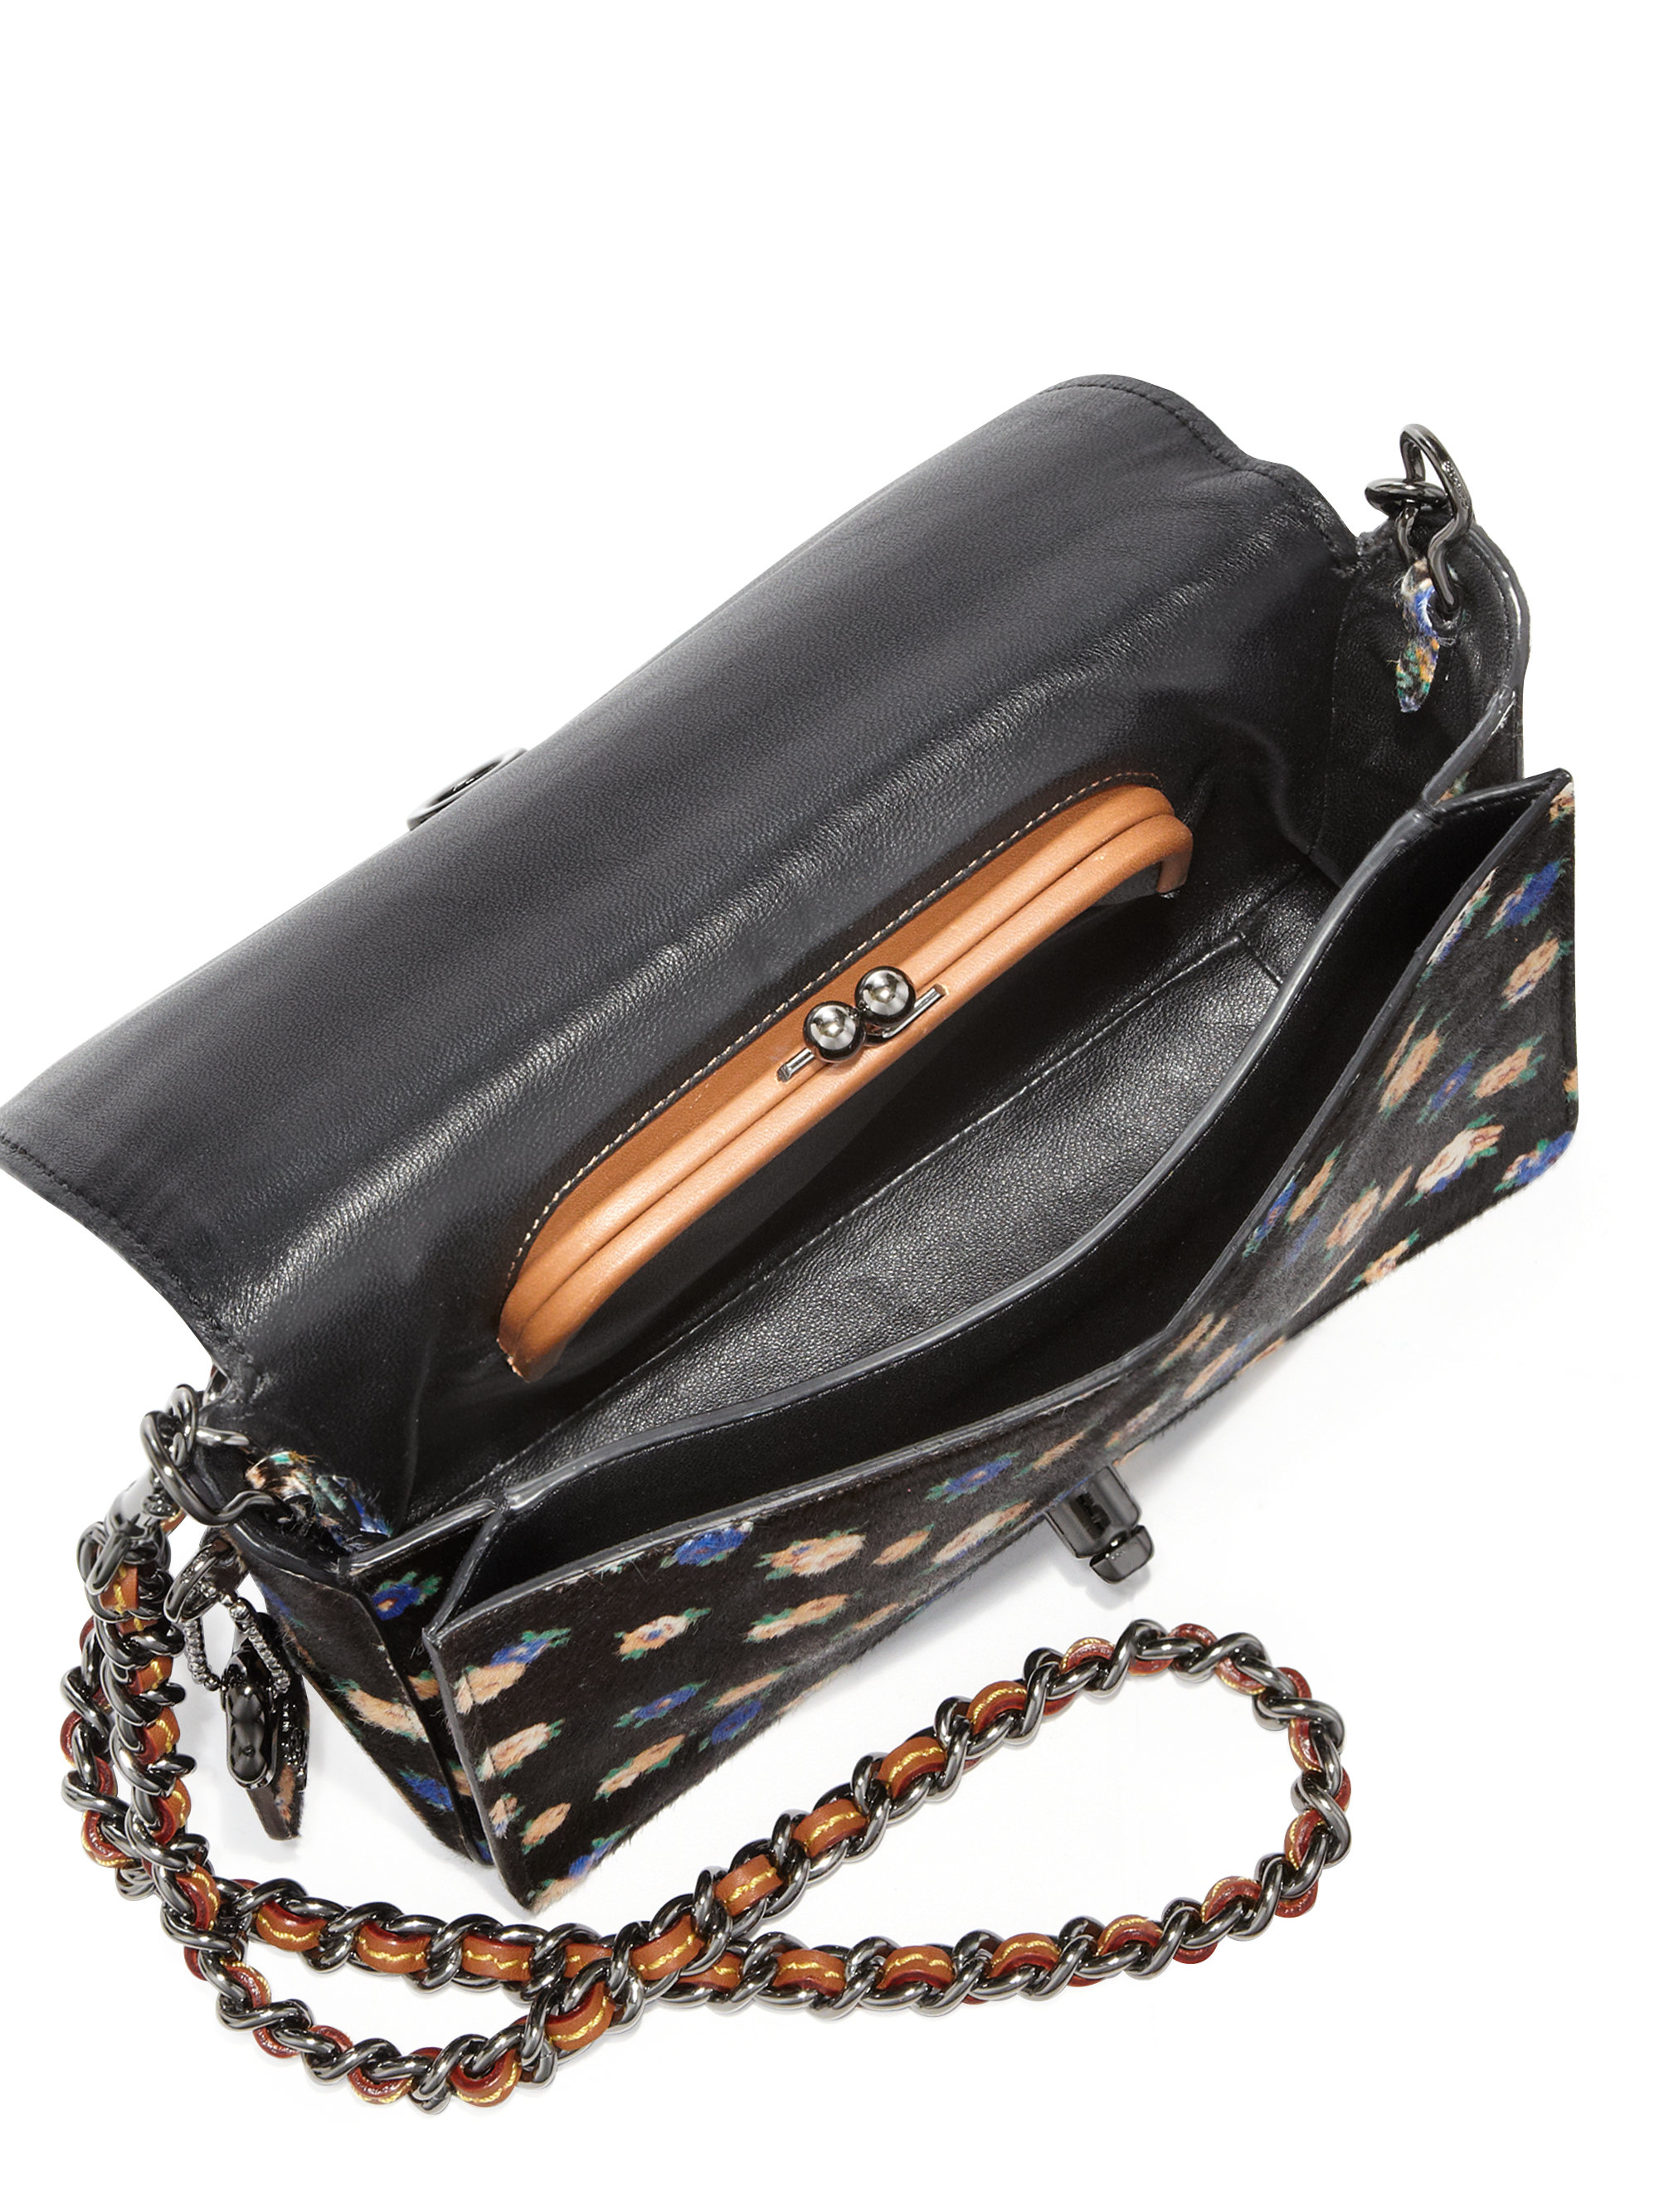 d2d34f6111de7 ... real lyst coach dinky 24 floral print calf hair crossbody bag in black  0354c 5ba5a